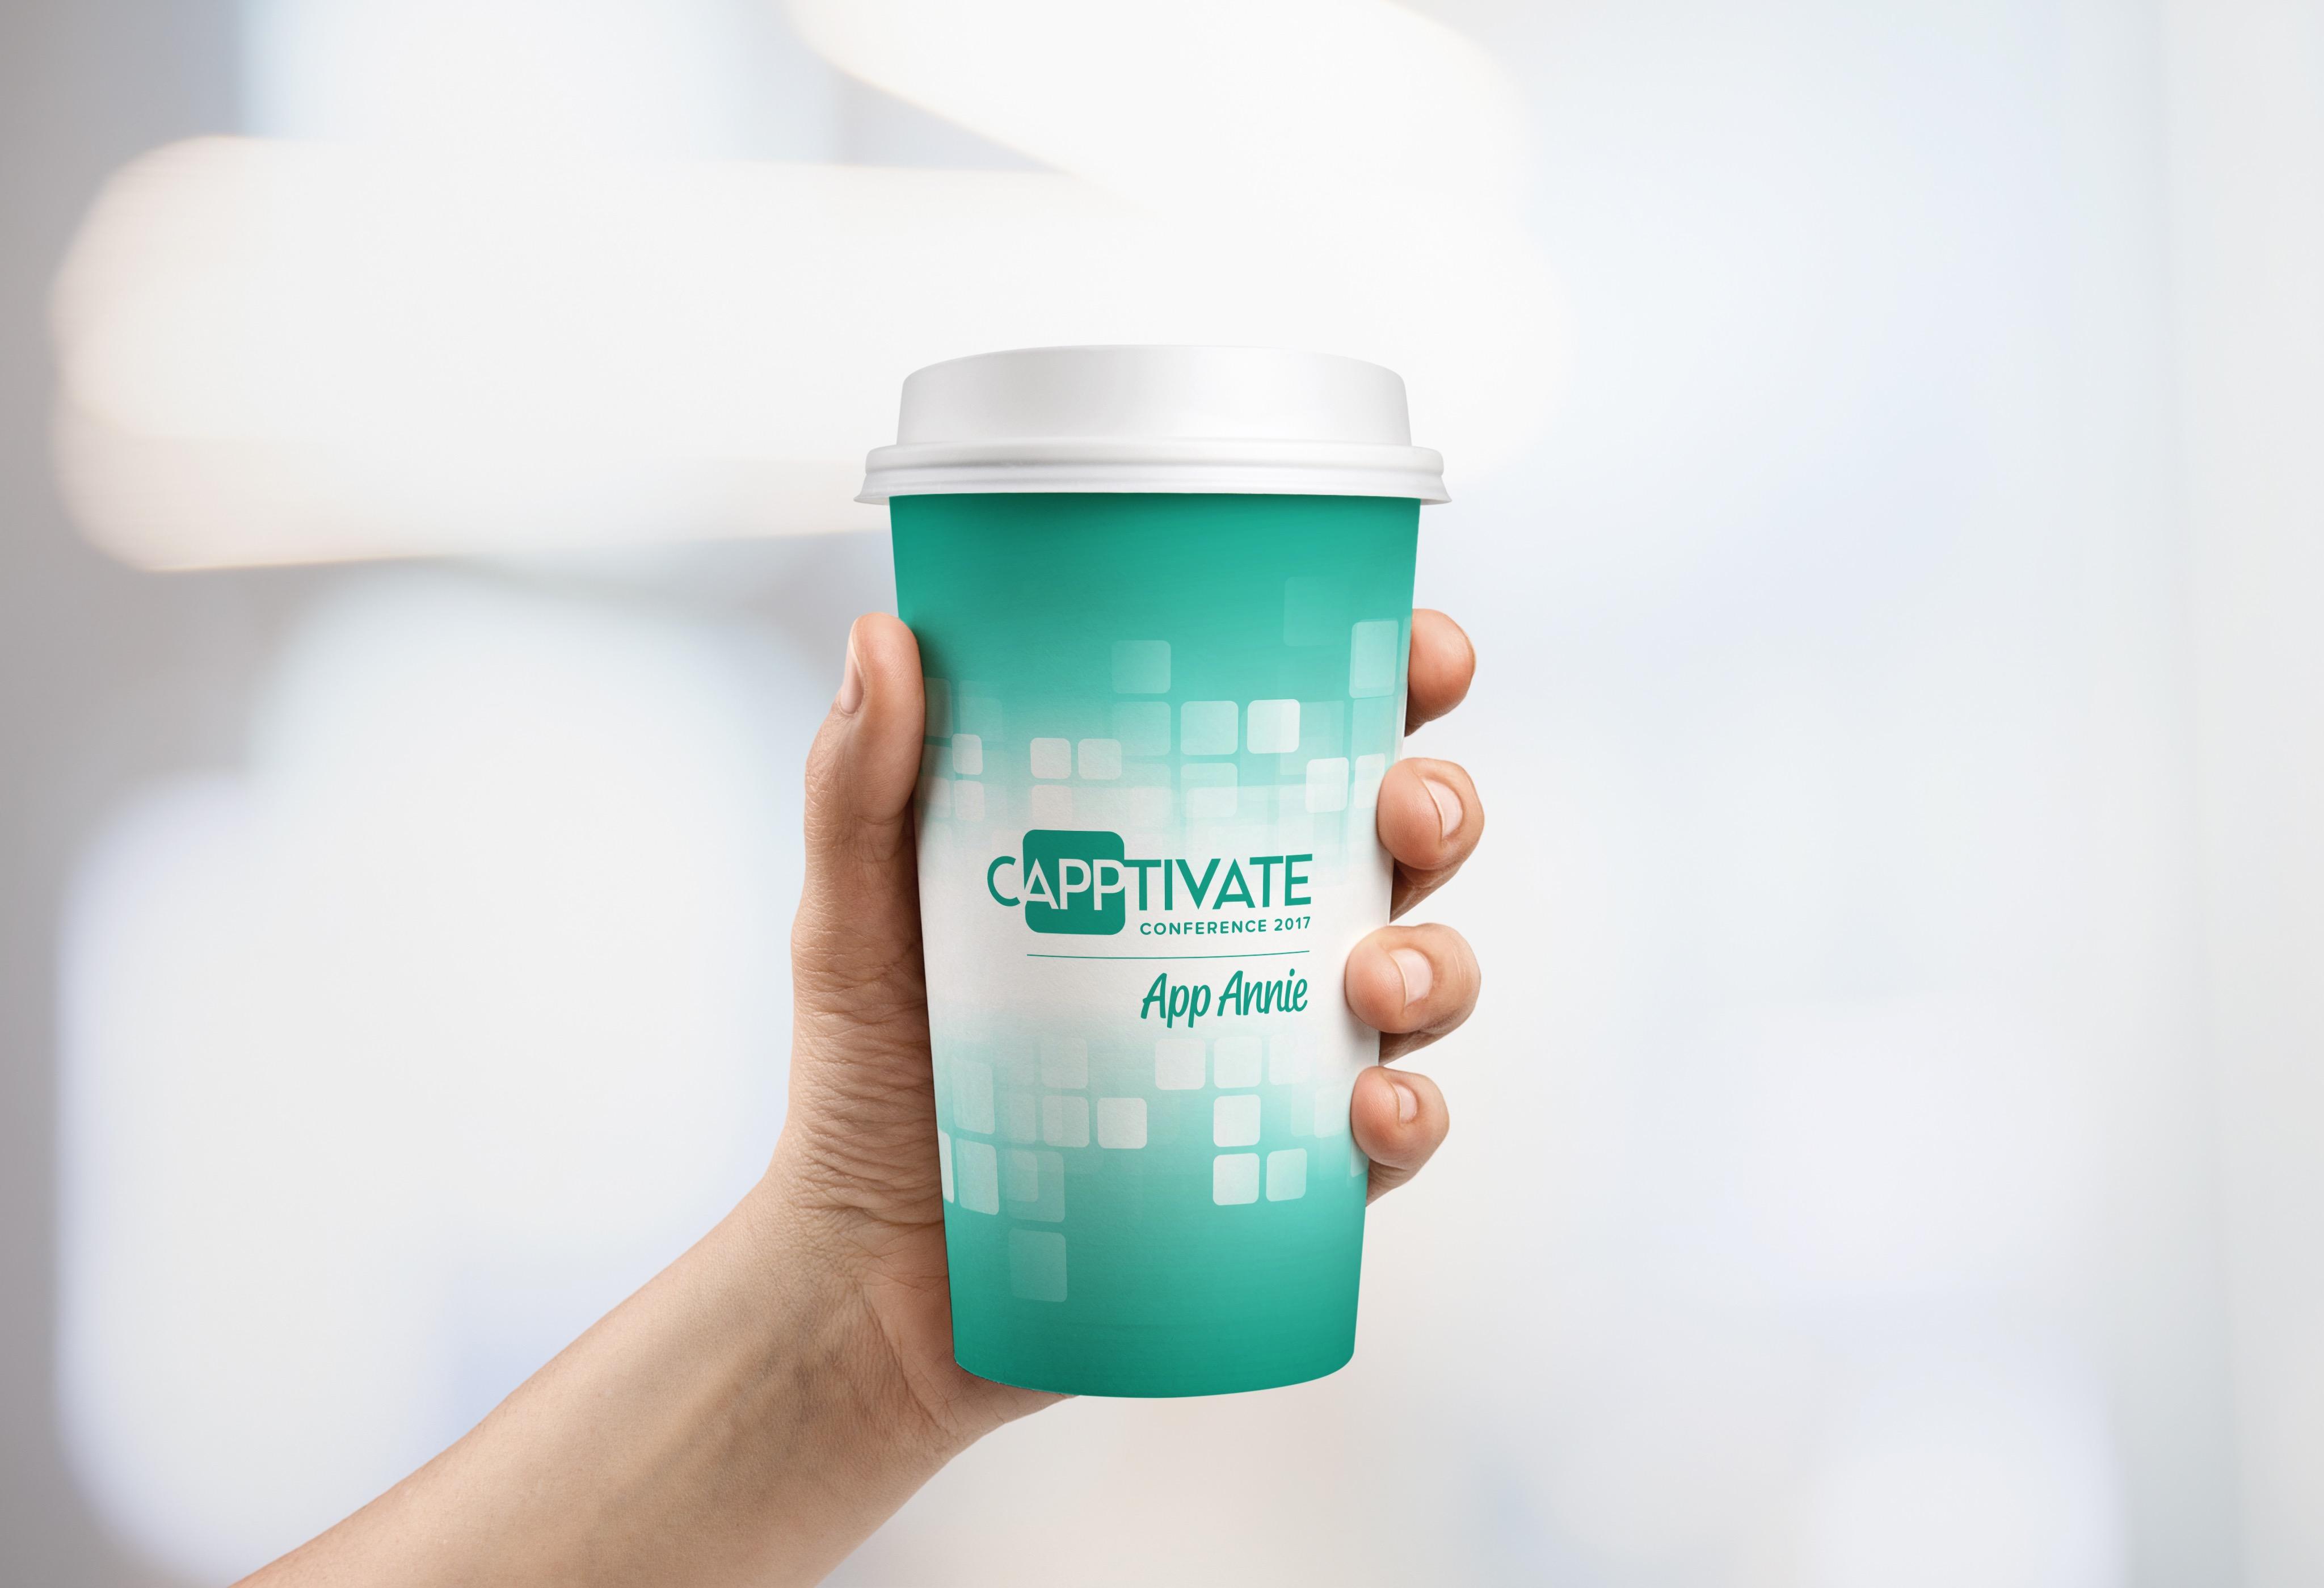 AppAnnie_Medium cup_green-small